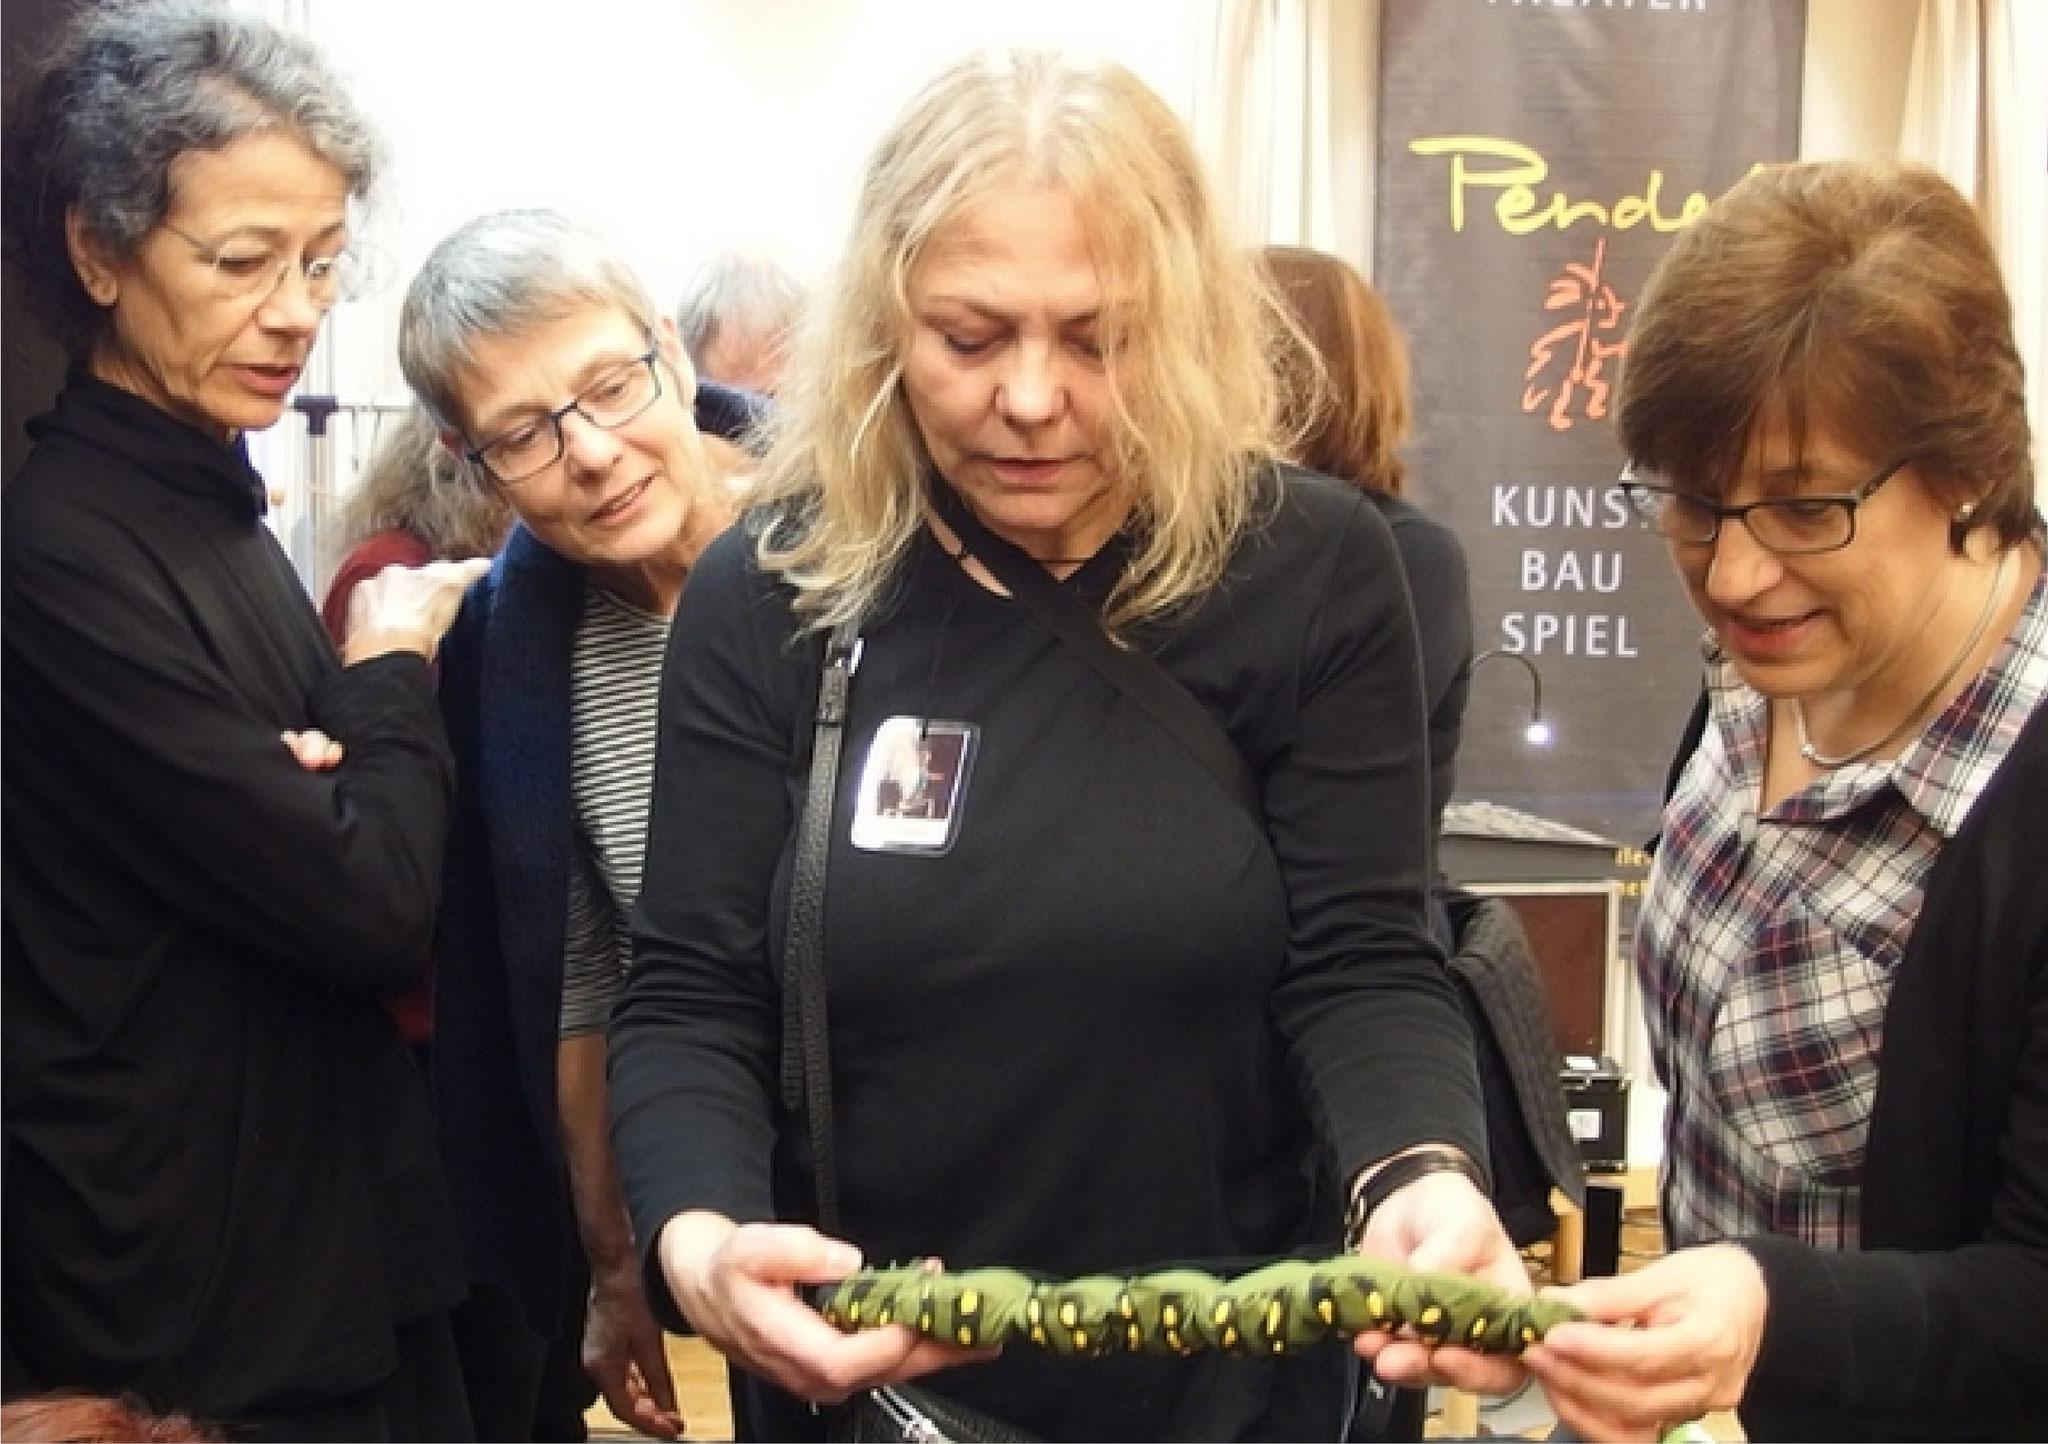 Catherine Cunz, Susanna Heller, Petra Kleefeld und Ingrid Jacobsen...